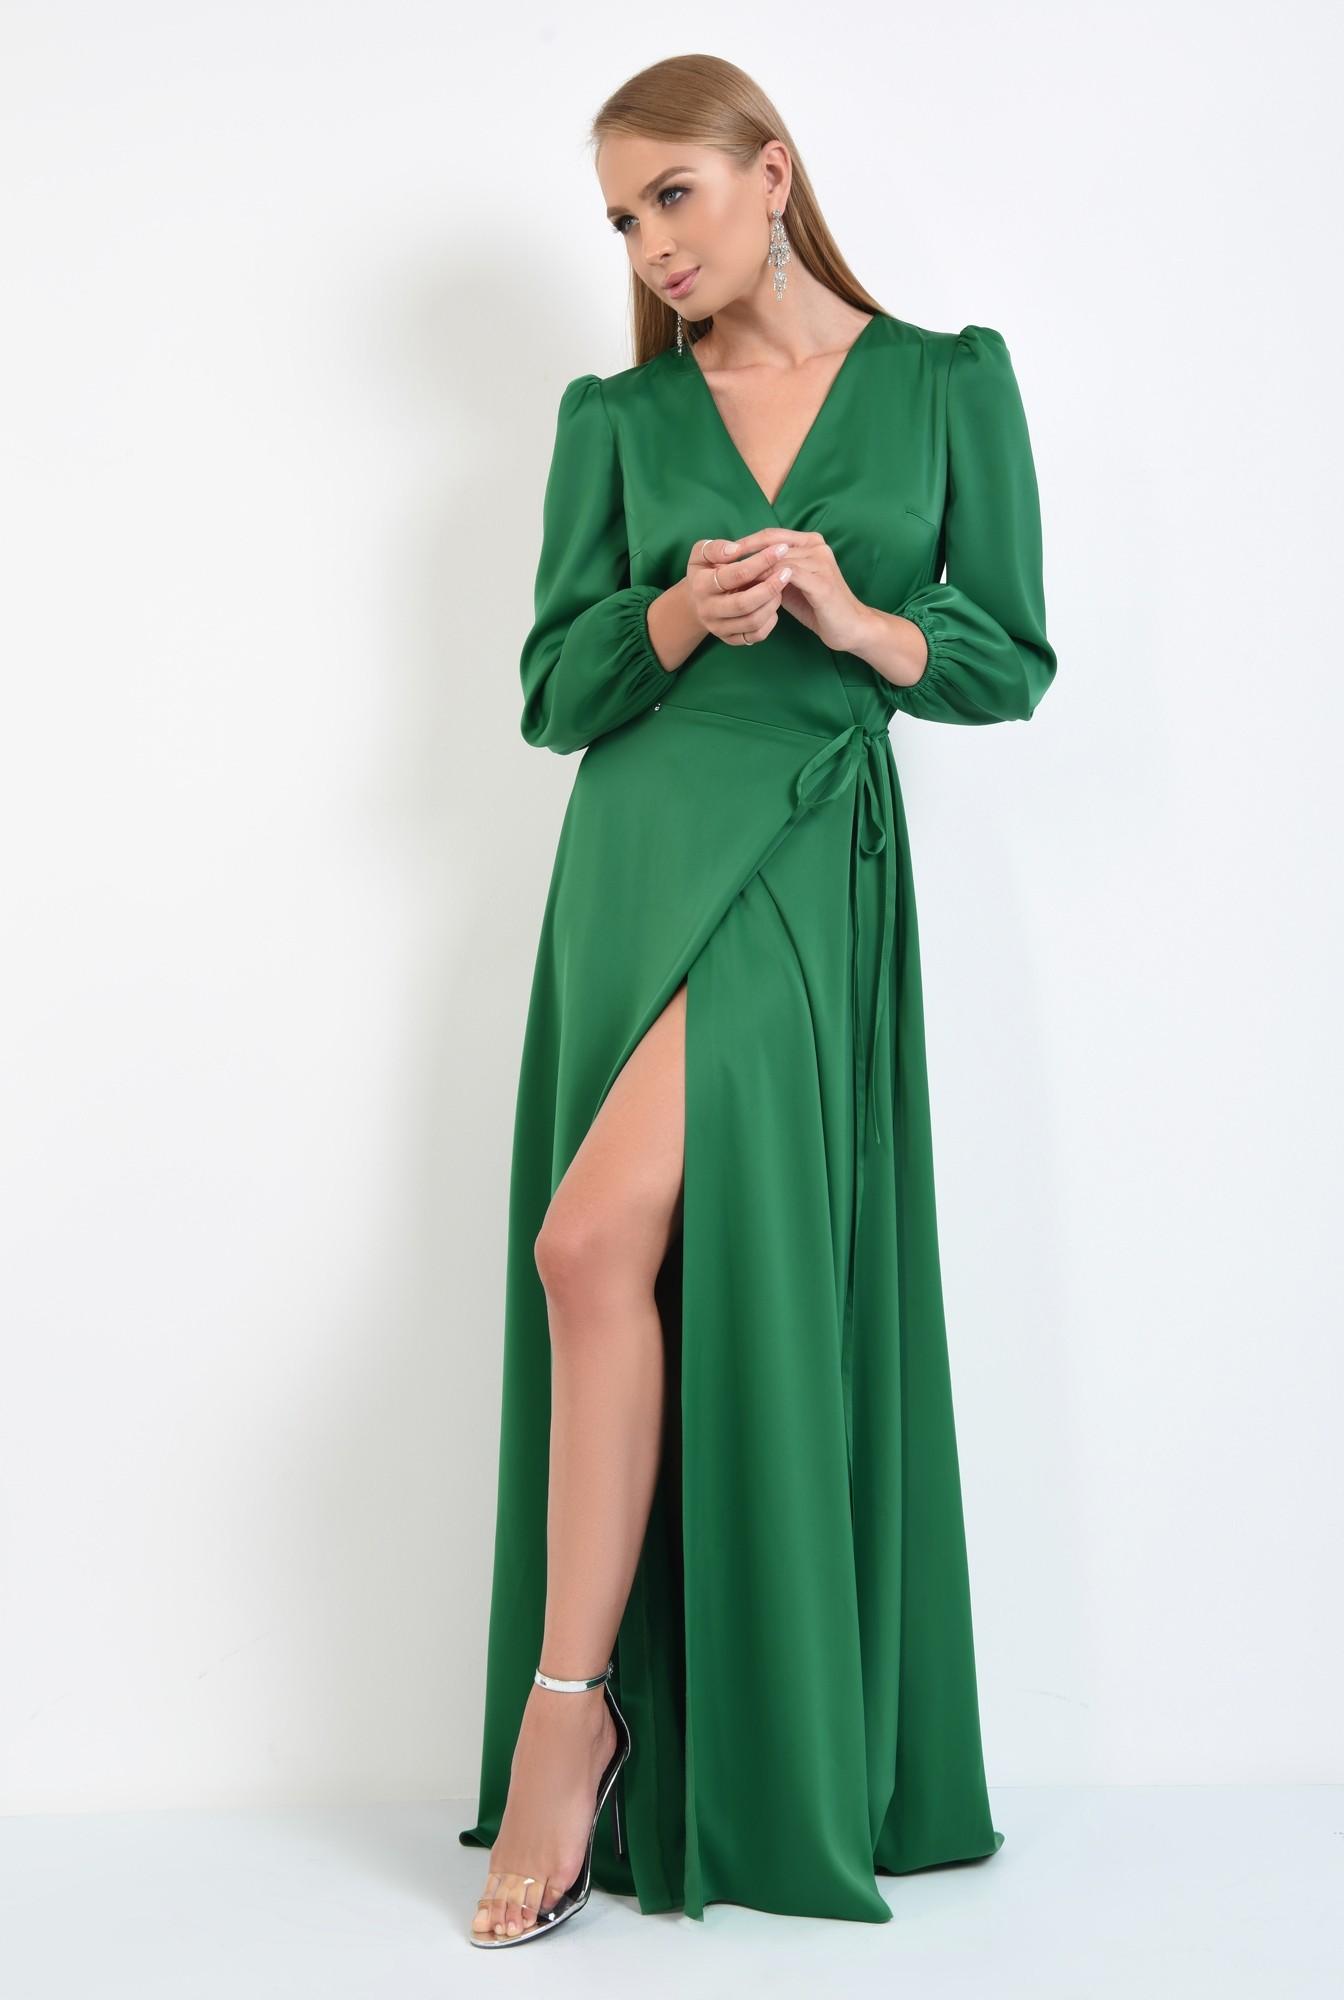 3 - rochie de seara, slit adanc, verde, satin, rochie maxi